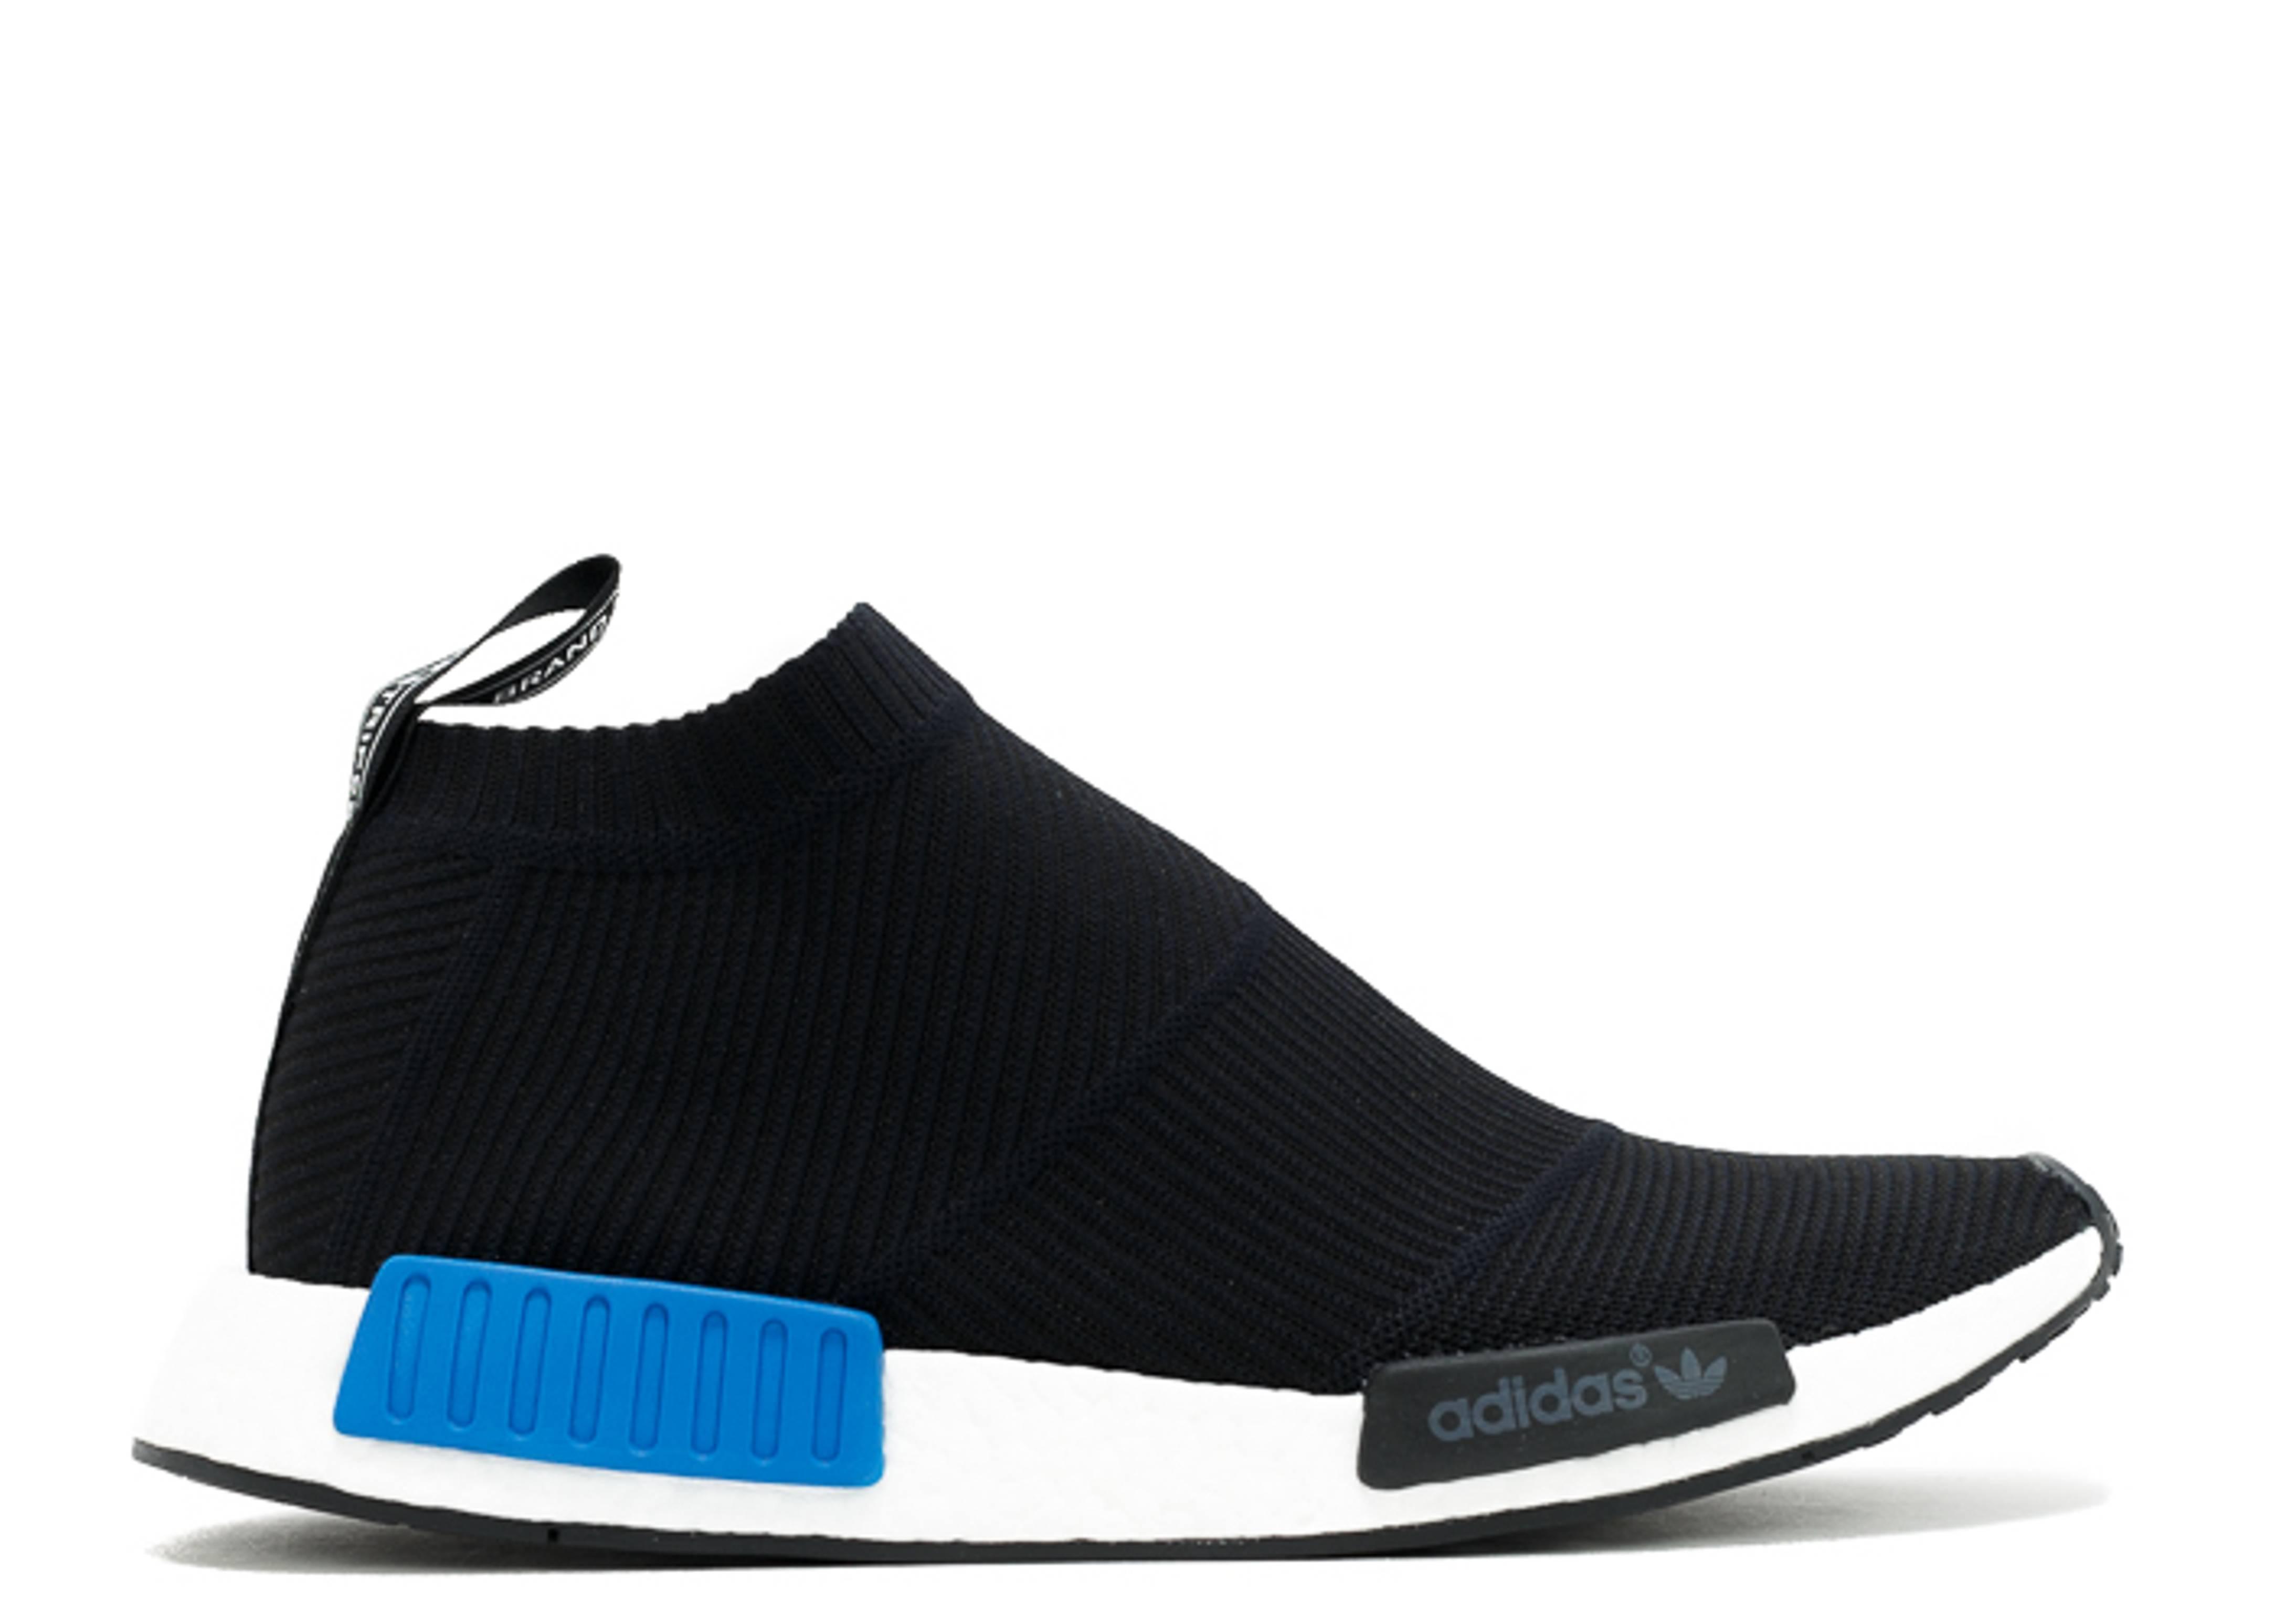 Salida Becks Kakadu  NMD_CS1 'Core Black' - Adidas - S79152 - core black/blue/whitw | Flight Club